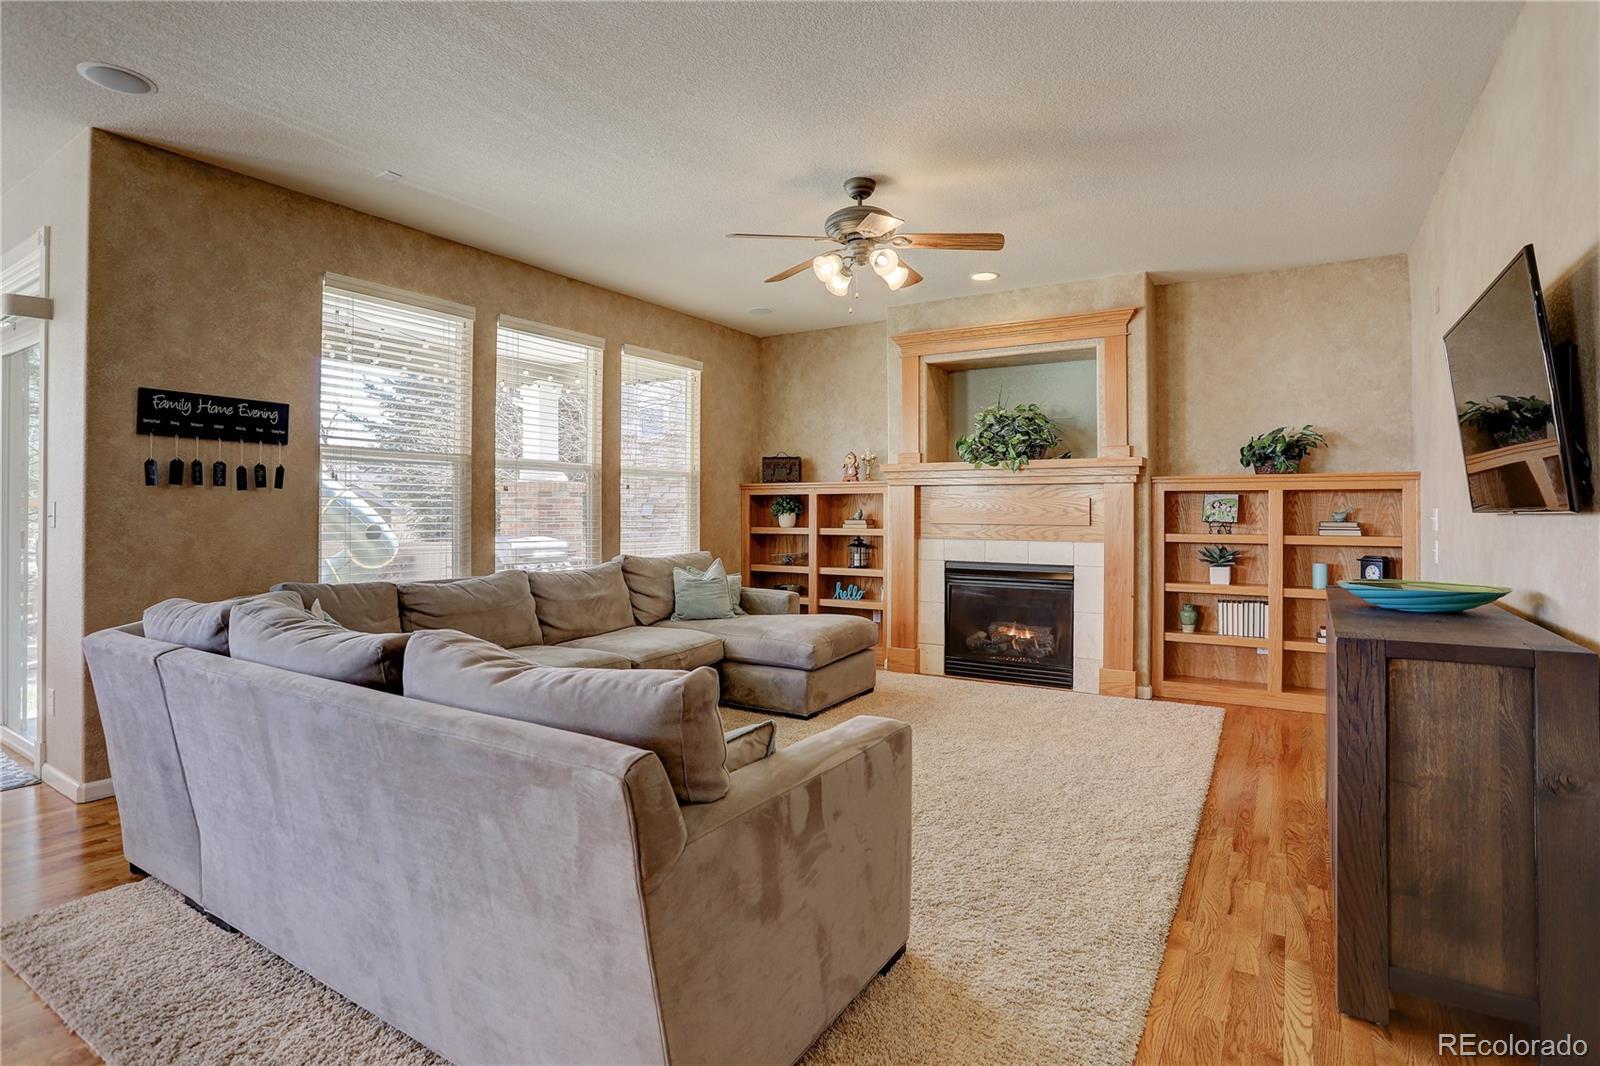 MLS# 3656997 - 7 - 10670 Addison Court, Highlands Ranch, CO 80126